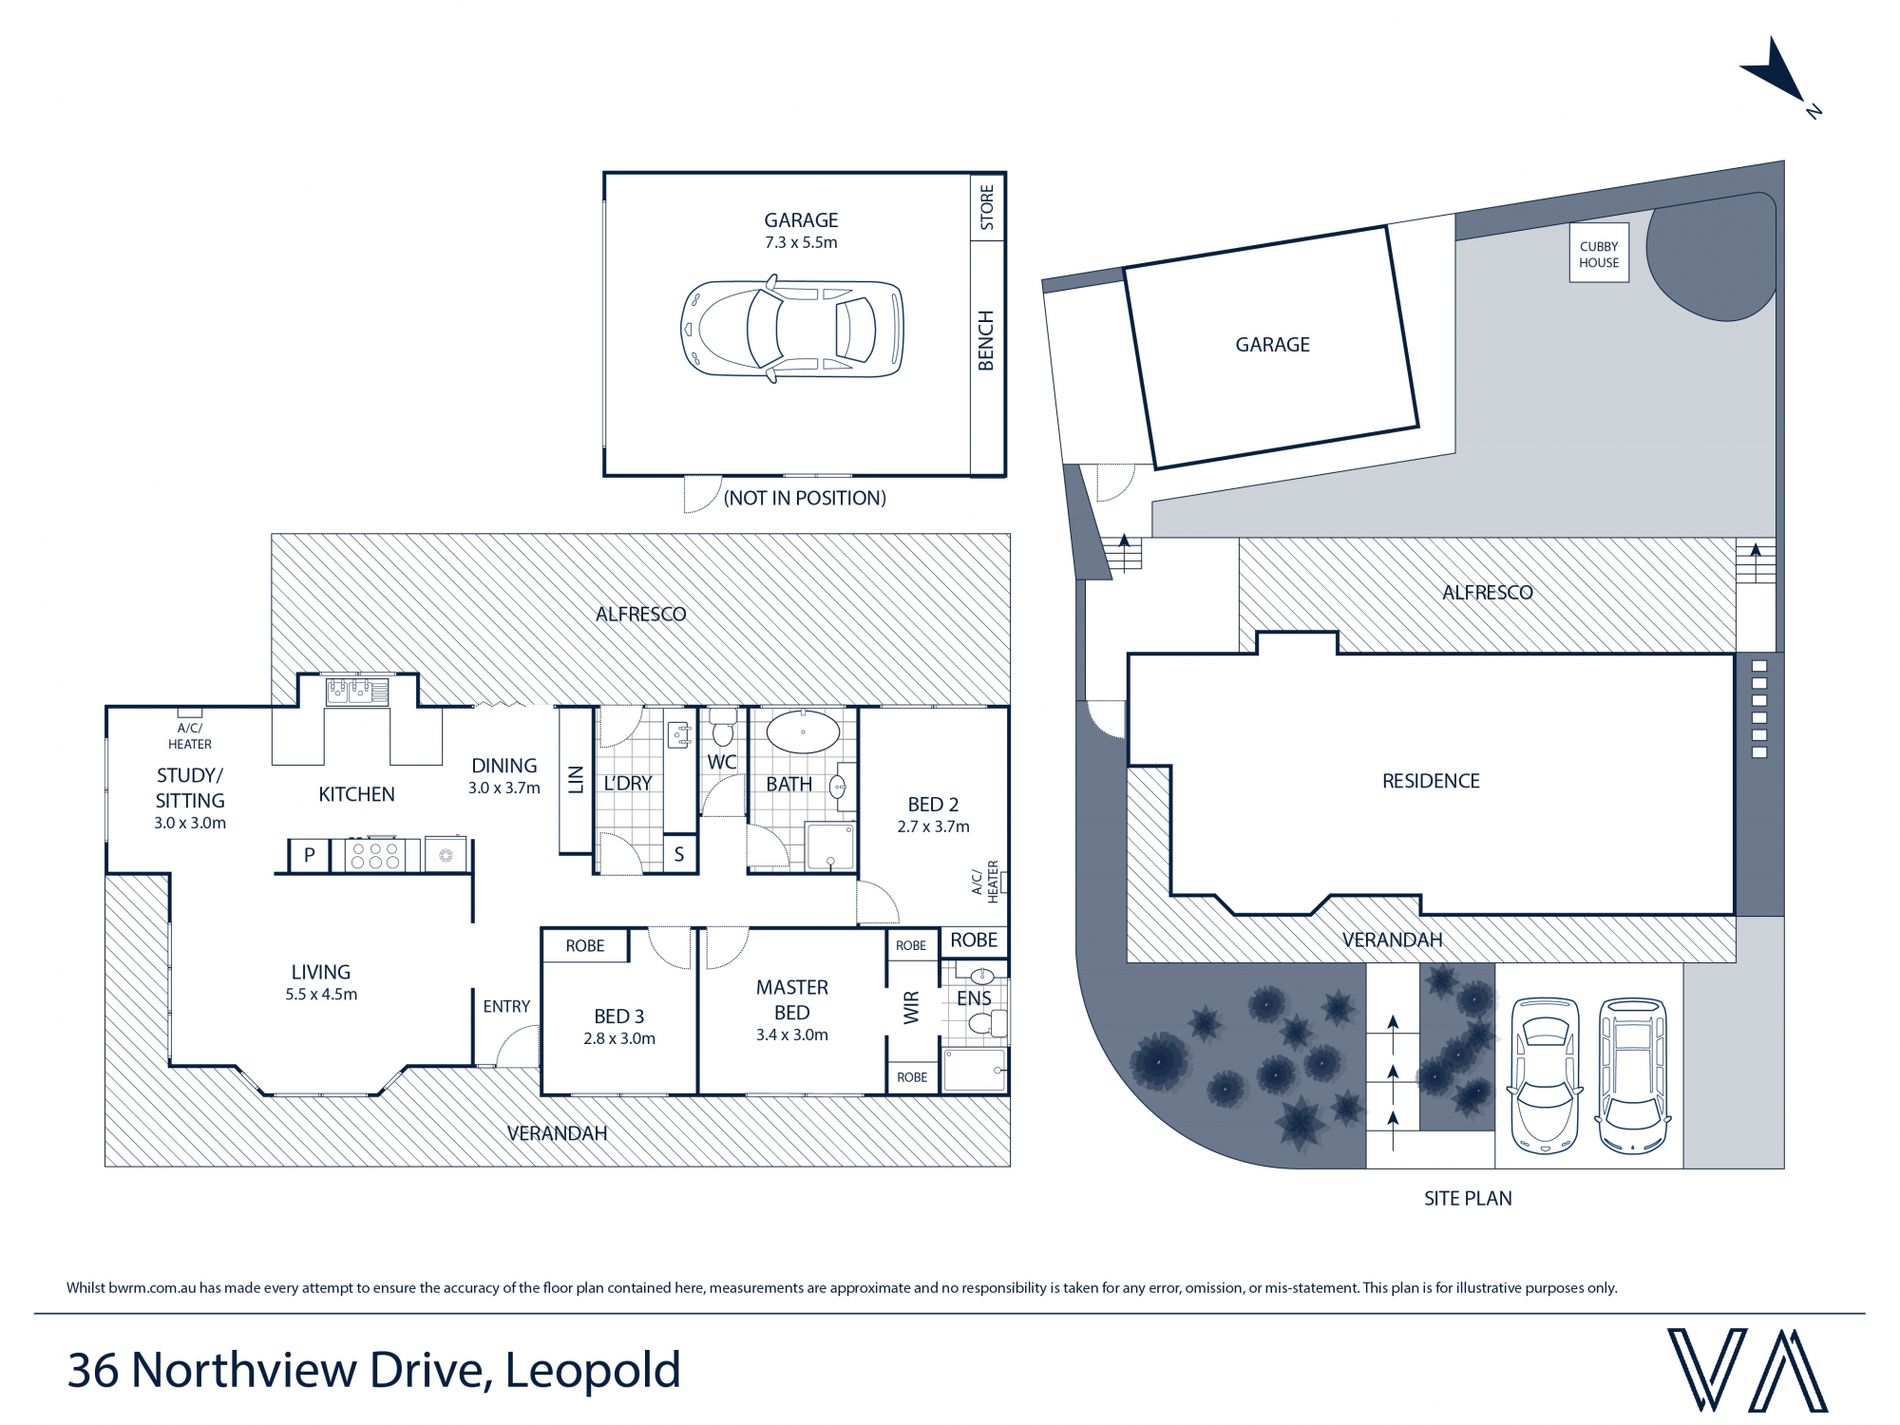 36 Northview Drive, Leopold